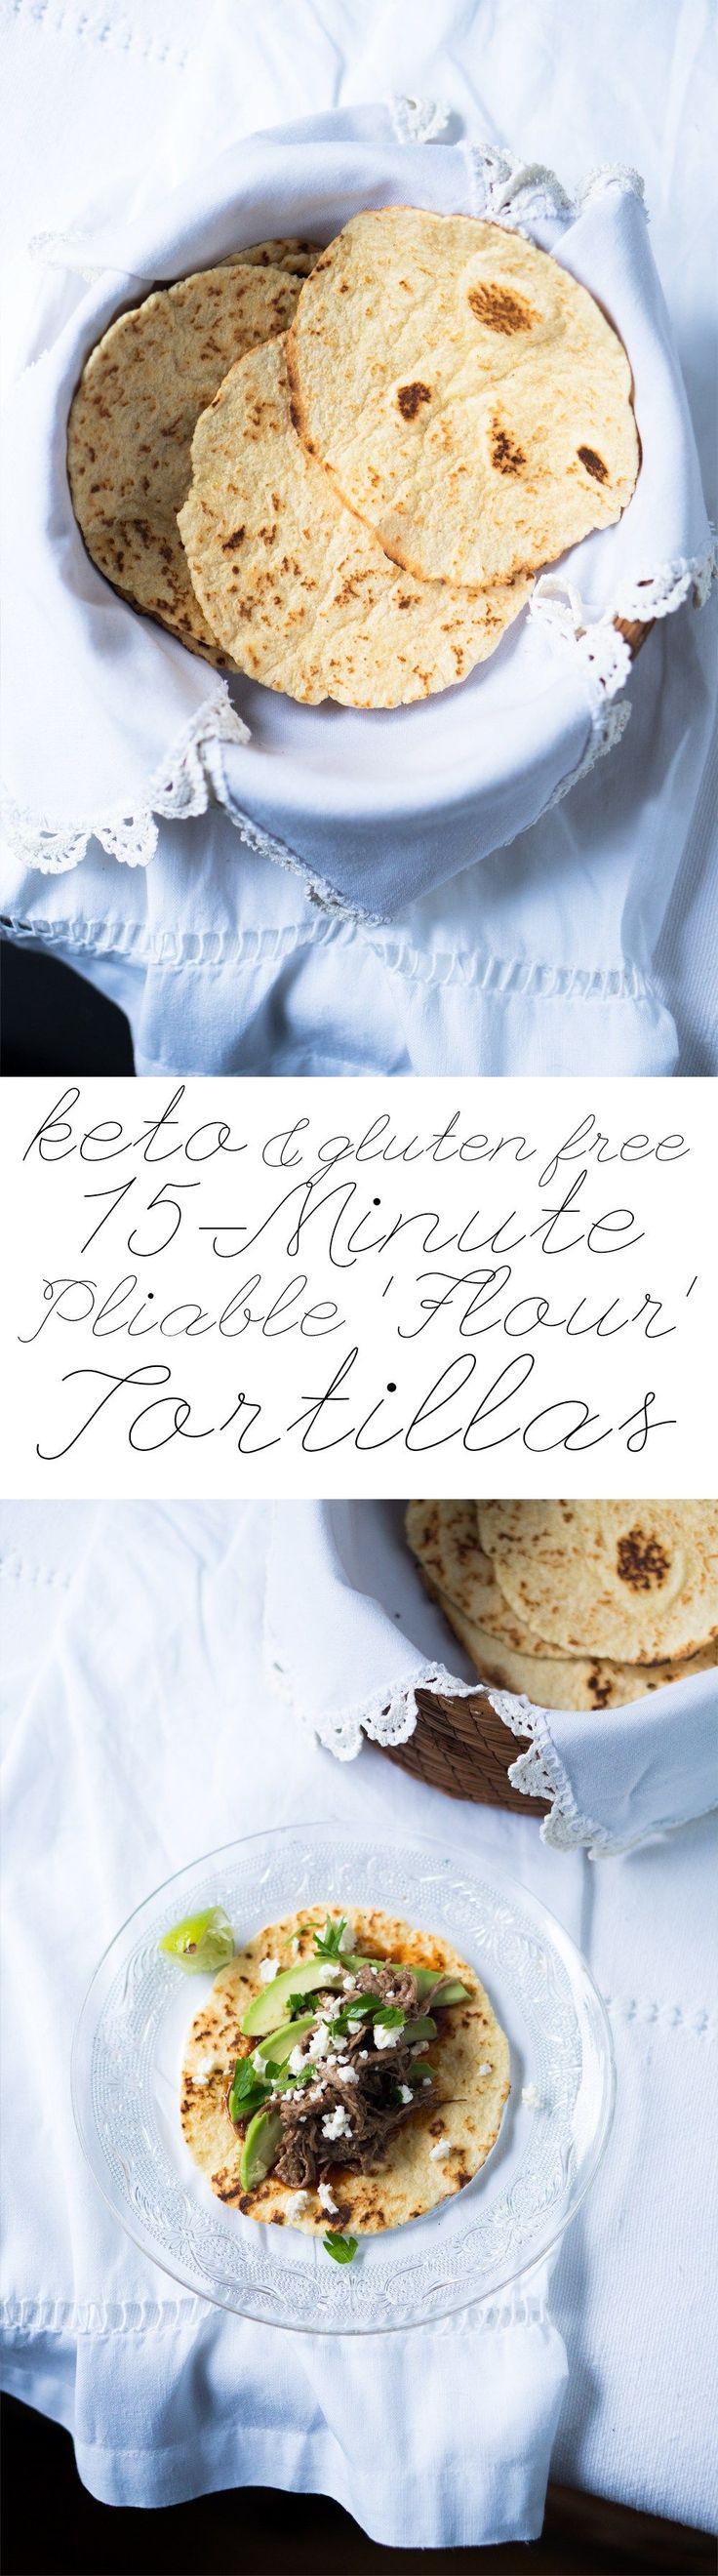 15-Minute Gluten Free & Keto Tortillas  Suuuper pliable, just 1 egg, & 2g net carbs!